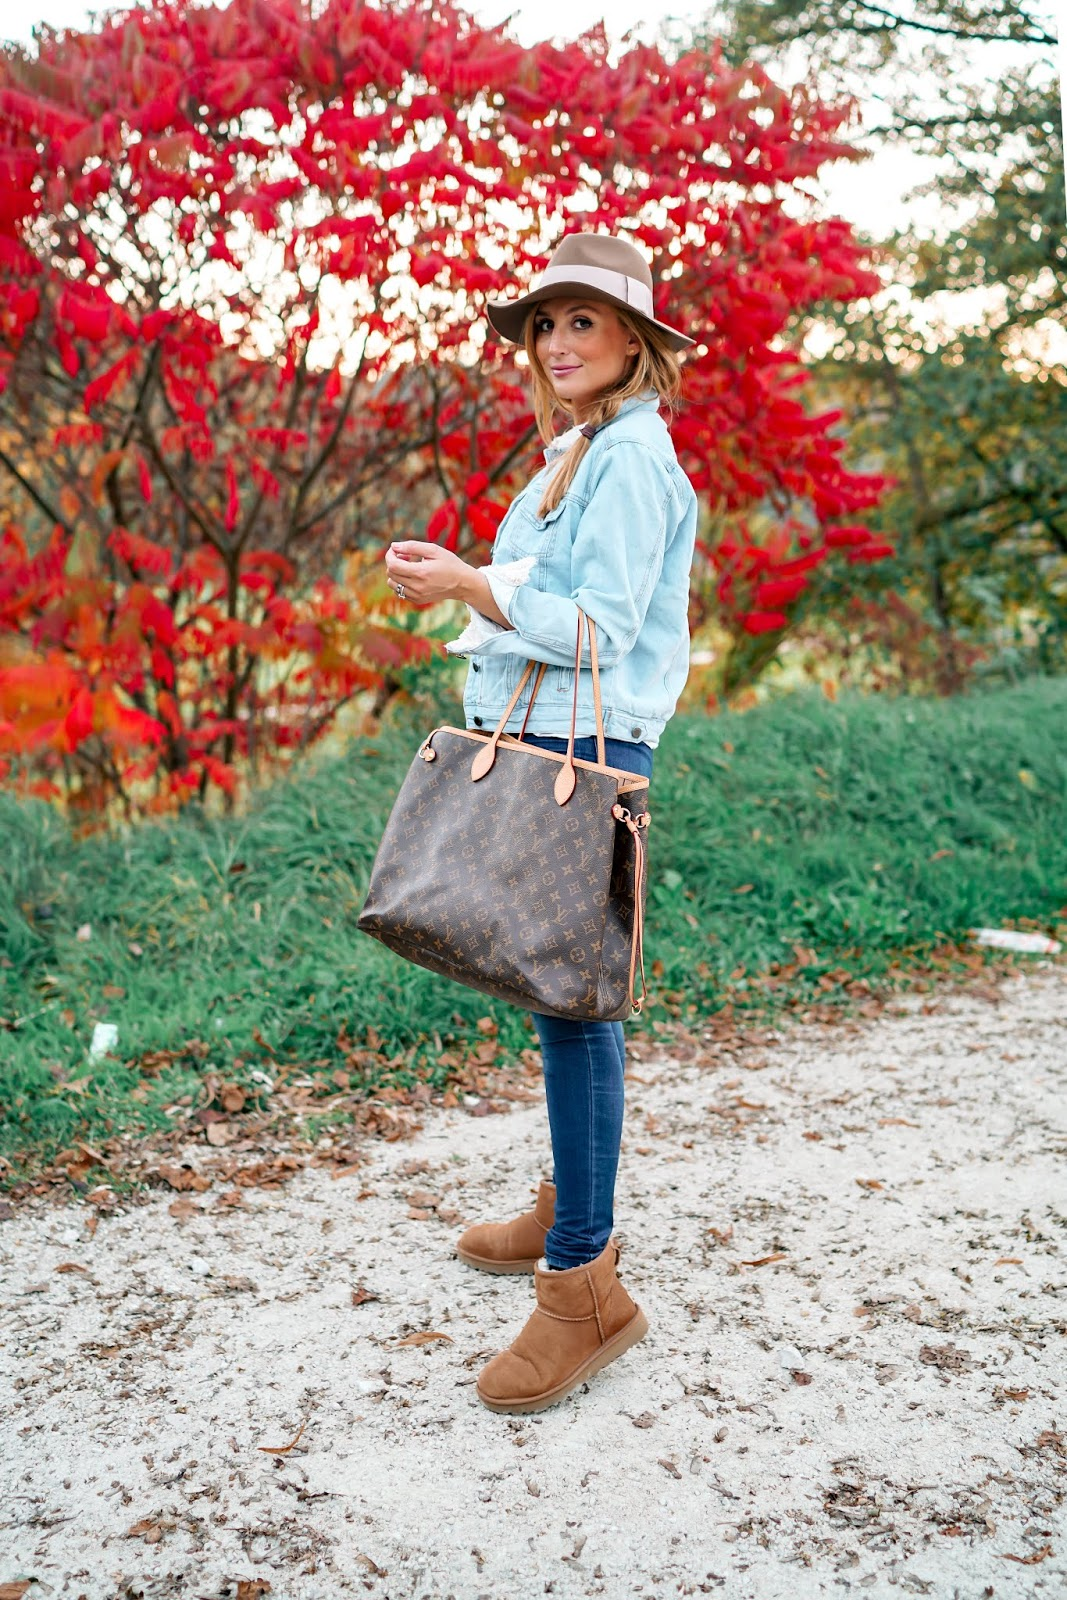 Fashionstylebyjohanna-Ugg-Boots-in-braun-Herbstoutfit-fedora-hut-filzhut-kombinieren-Louis-vuitton-tasche-neverfull-GM.